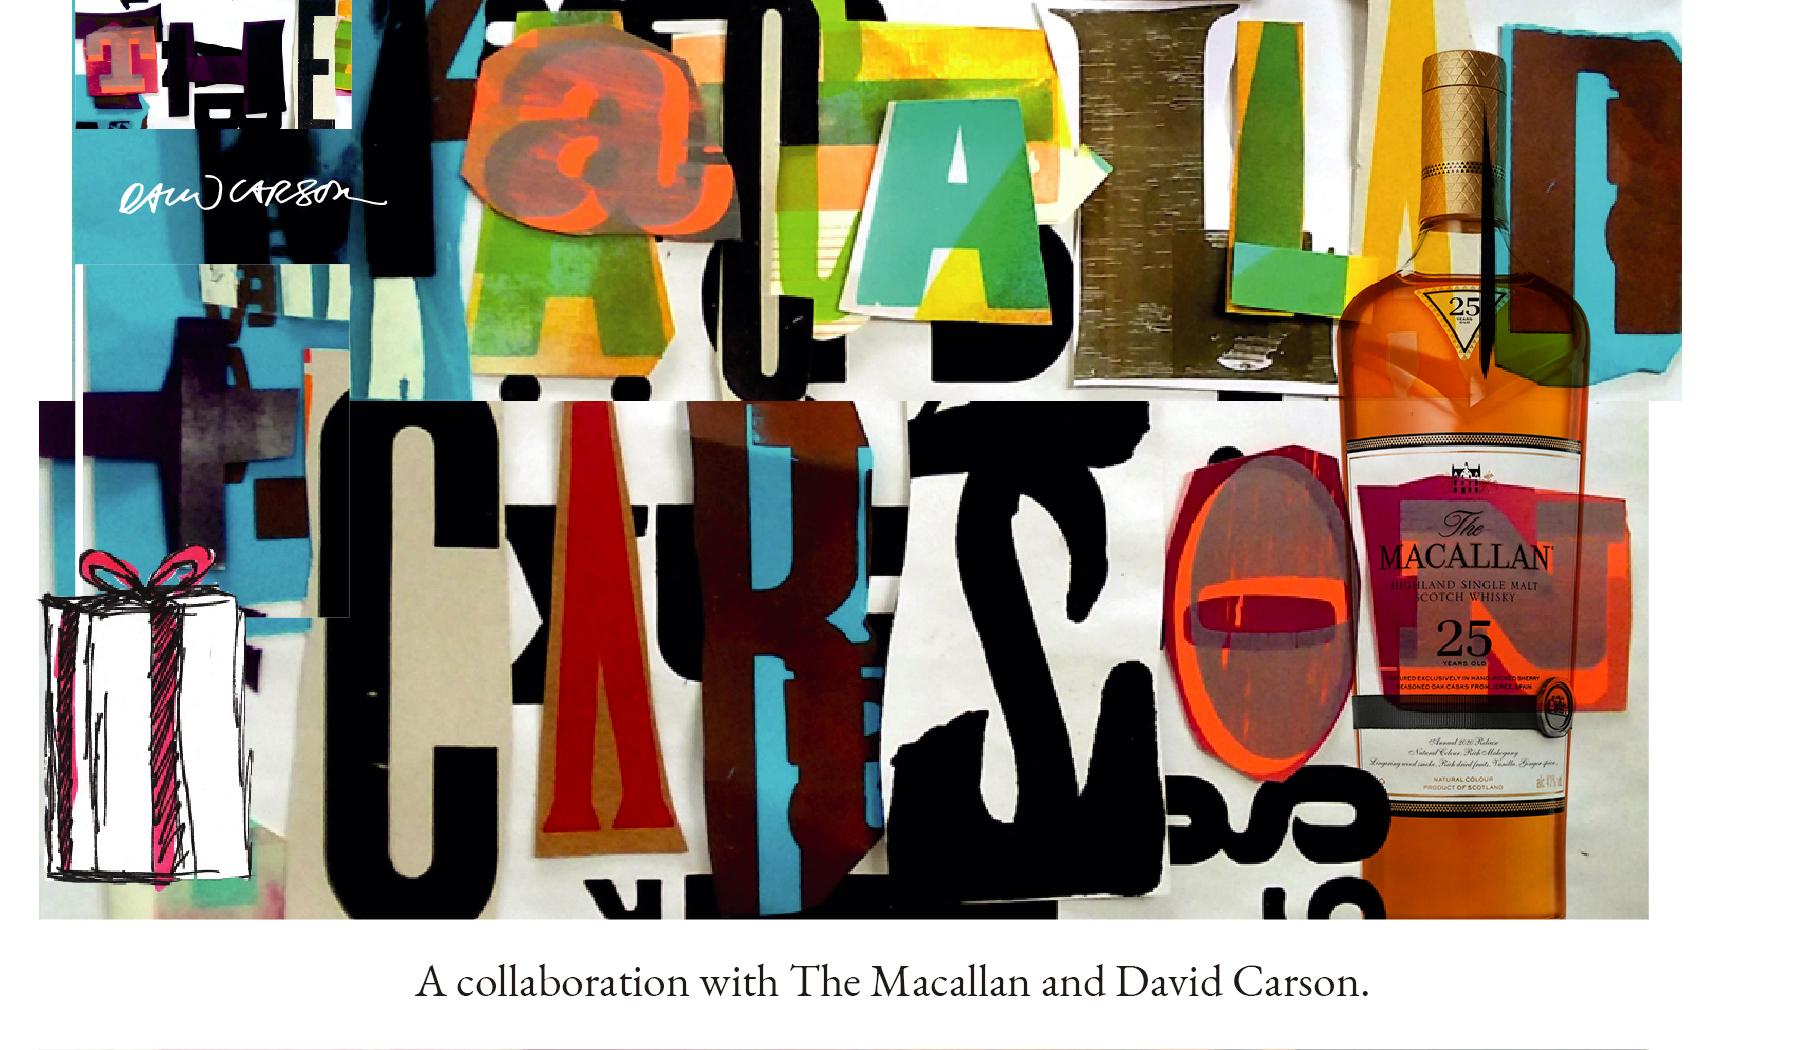 The Macallan and David Carson